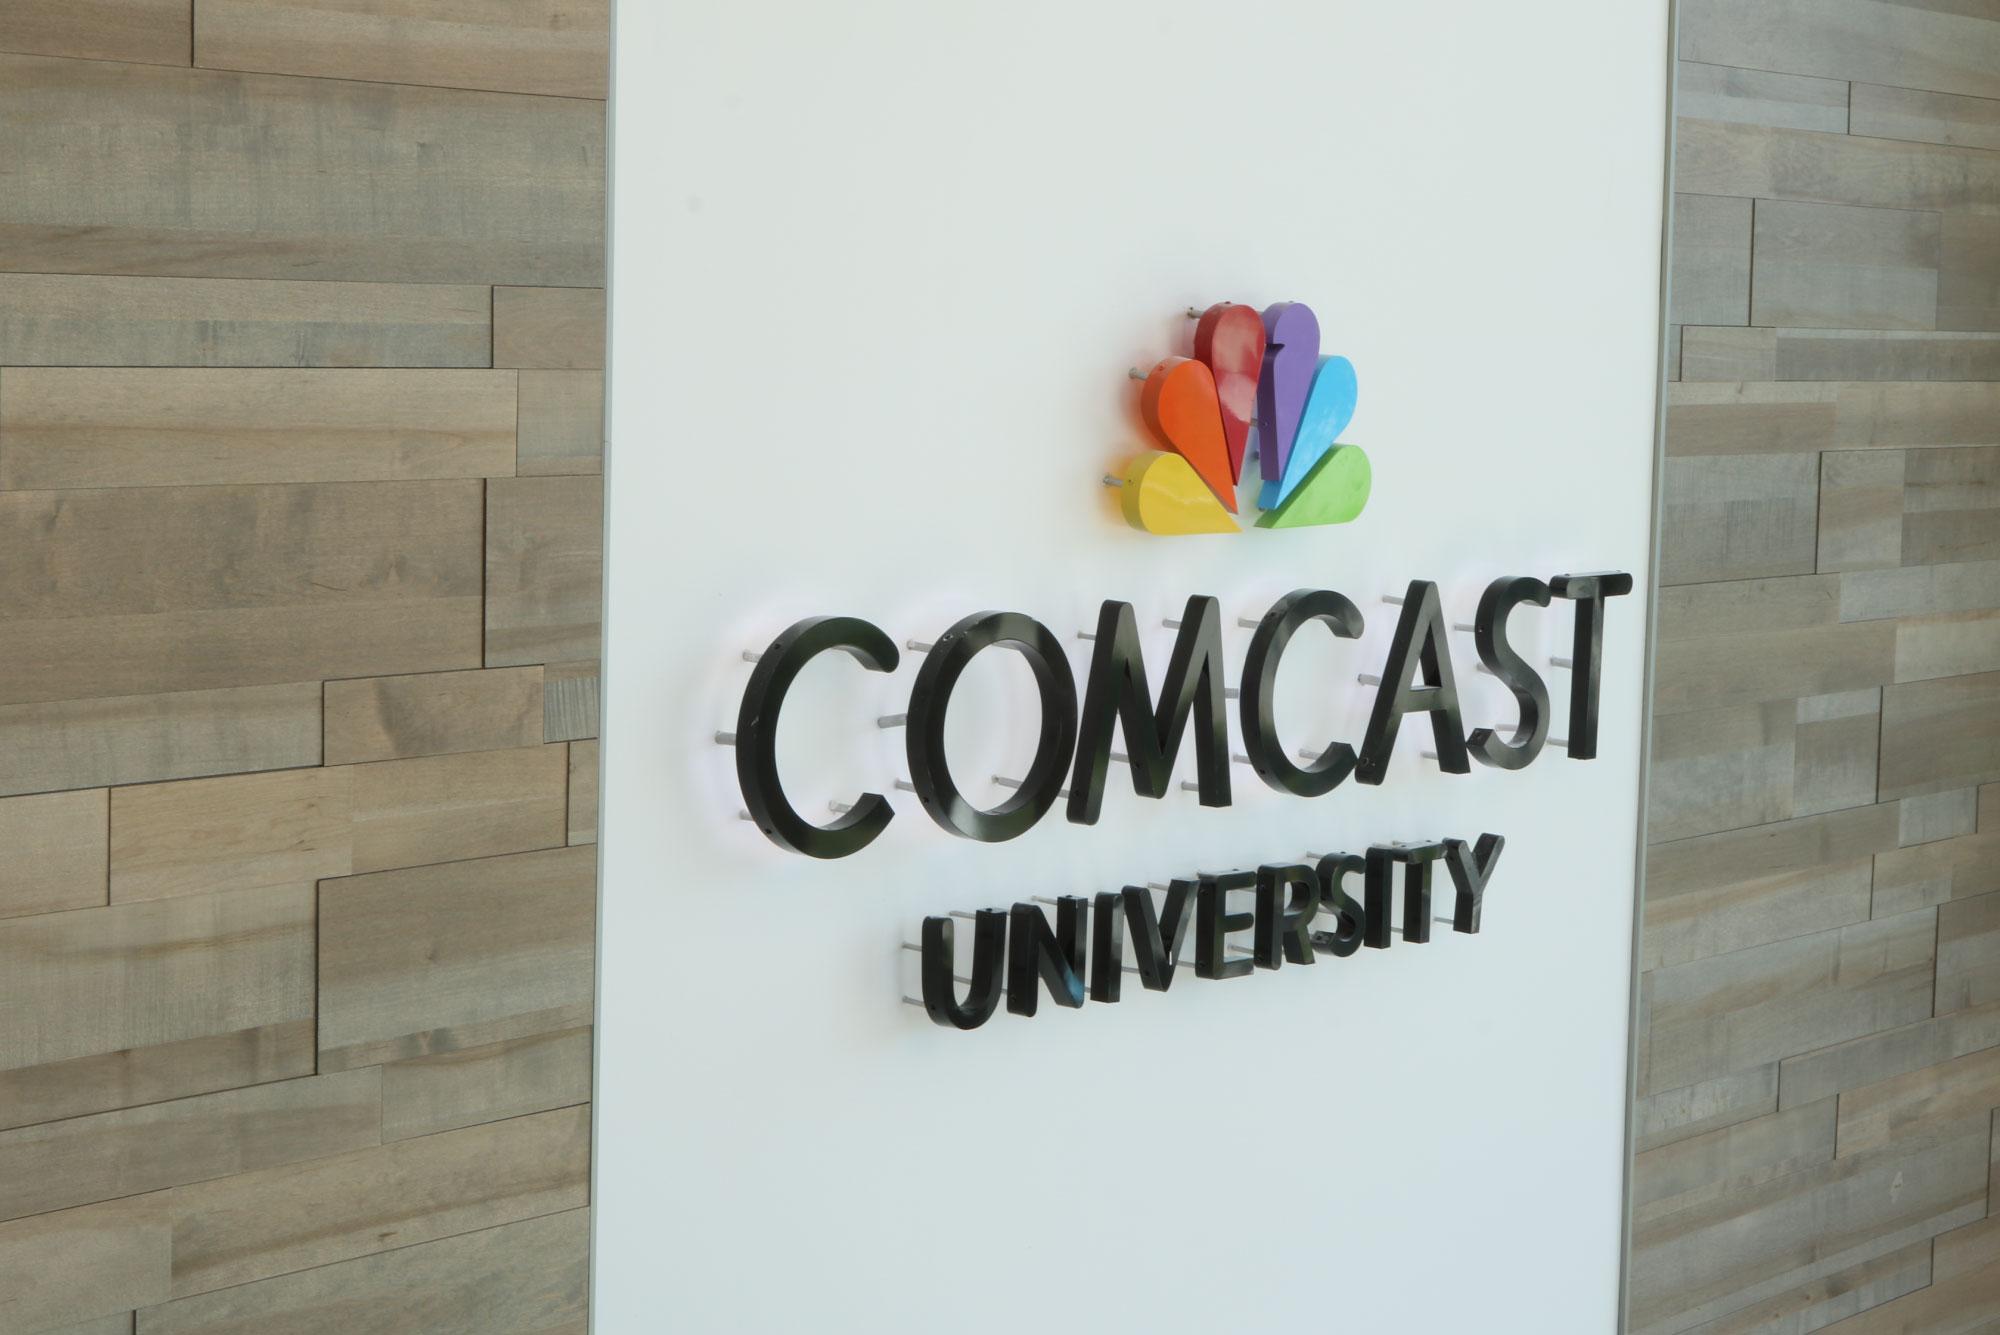 Comcast University